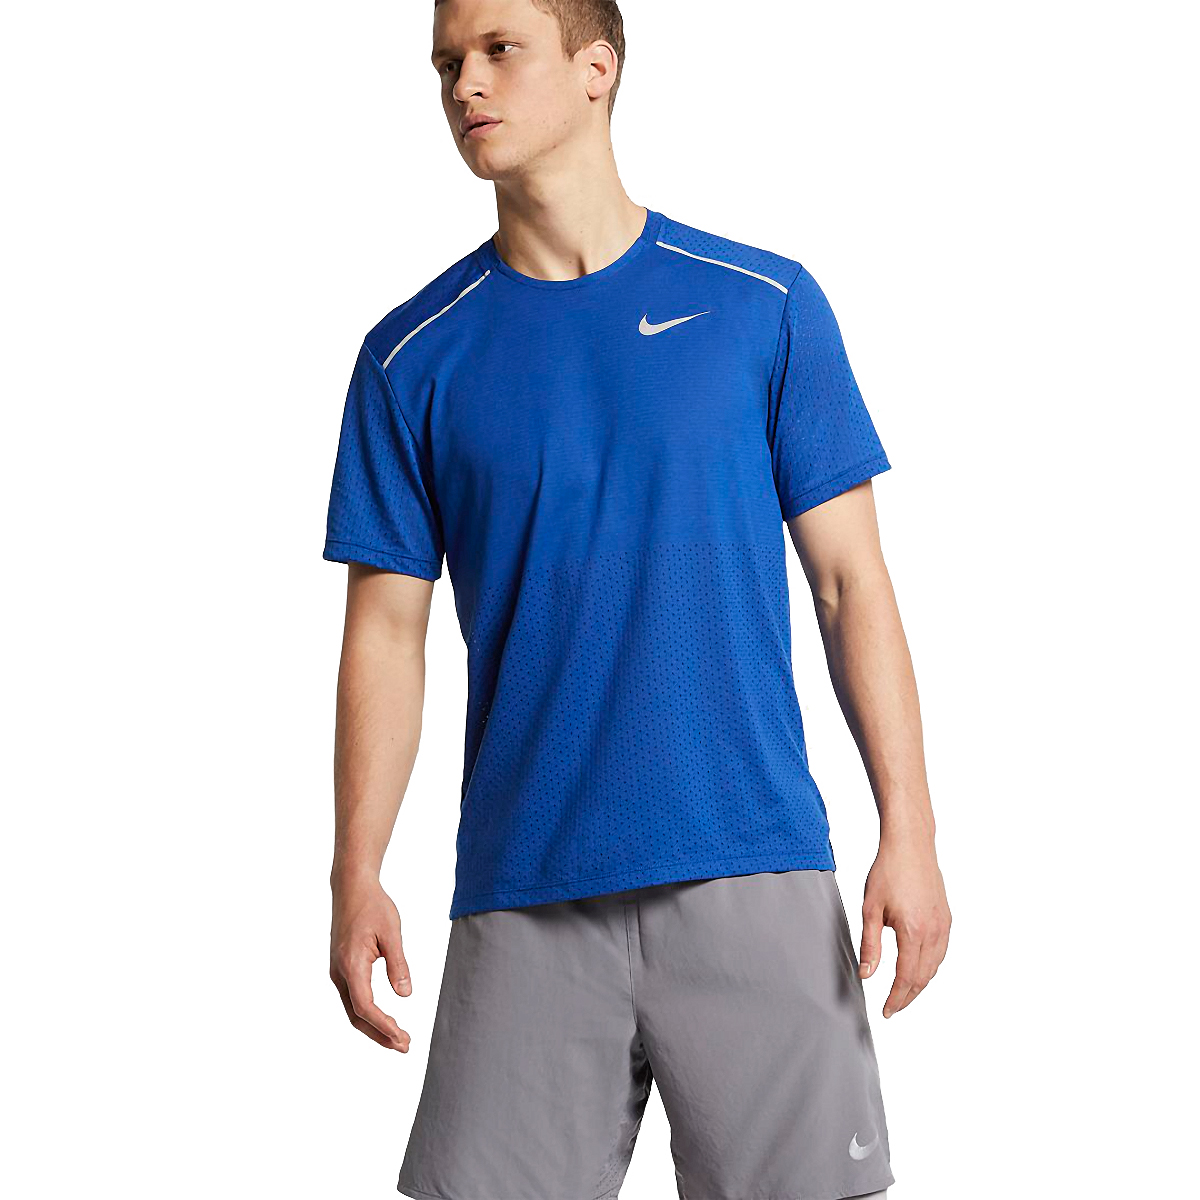 Men's Nike Breathe Rise 365 Short Sleeve  - Color: Indigo Force/Reflective - Size: S, Indigo Force/Reflective, large, image 1